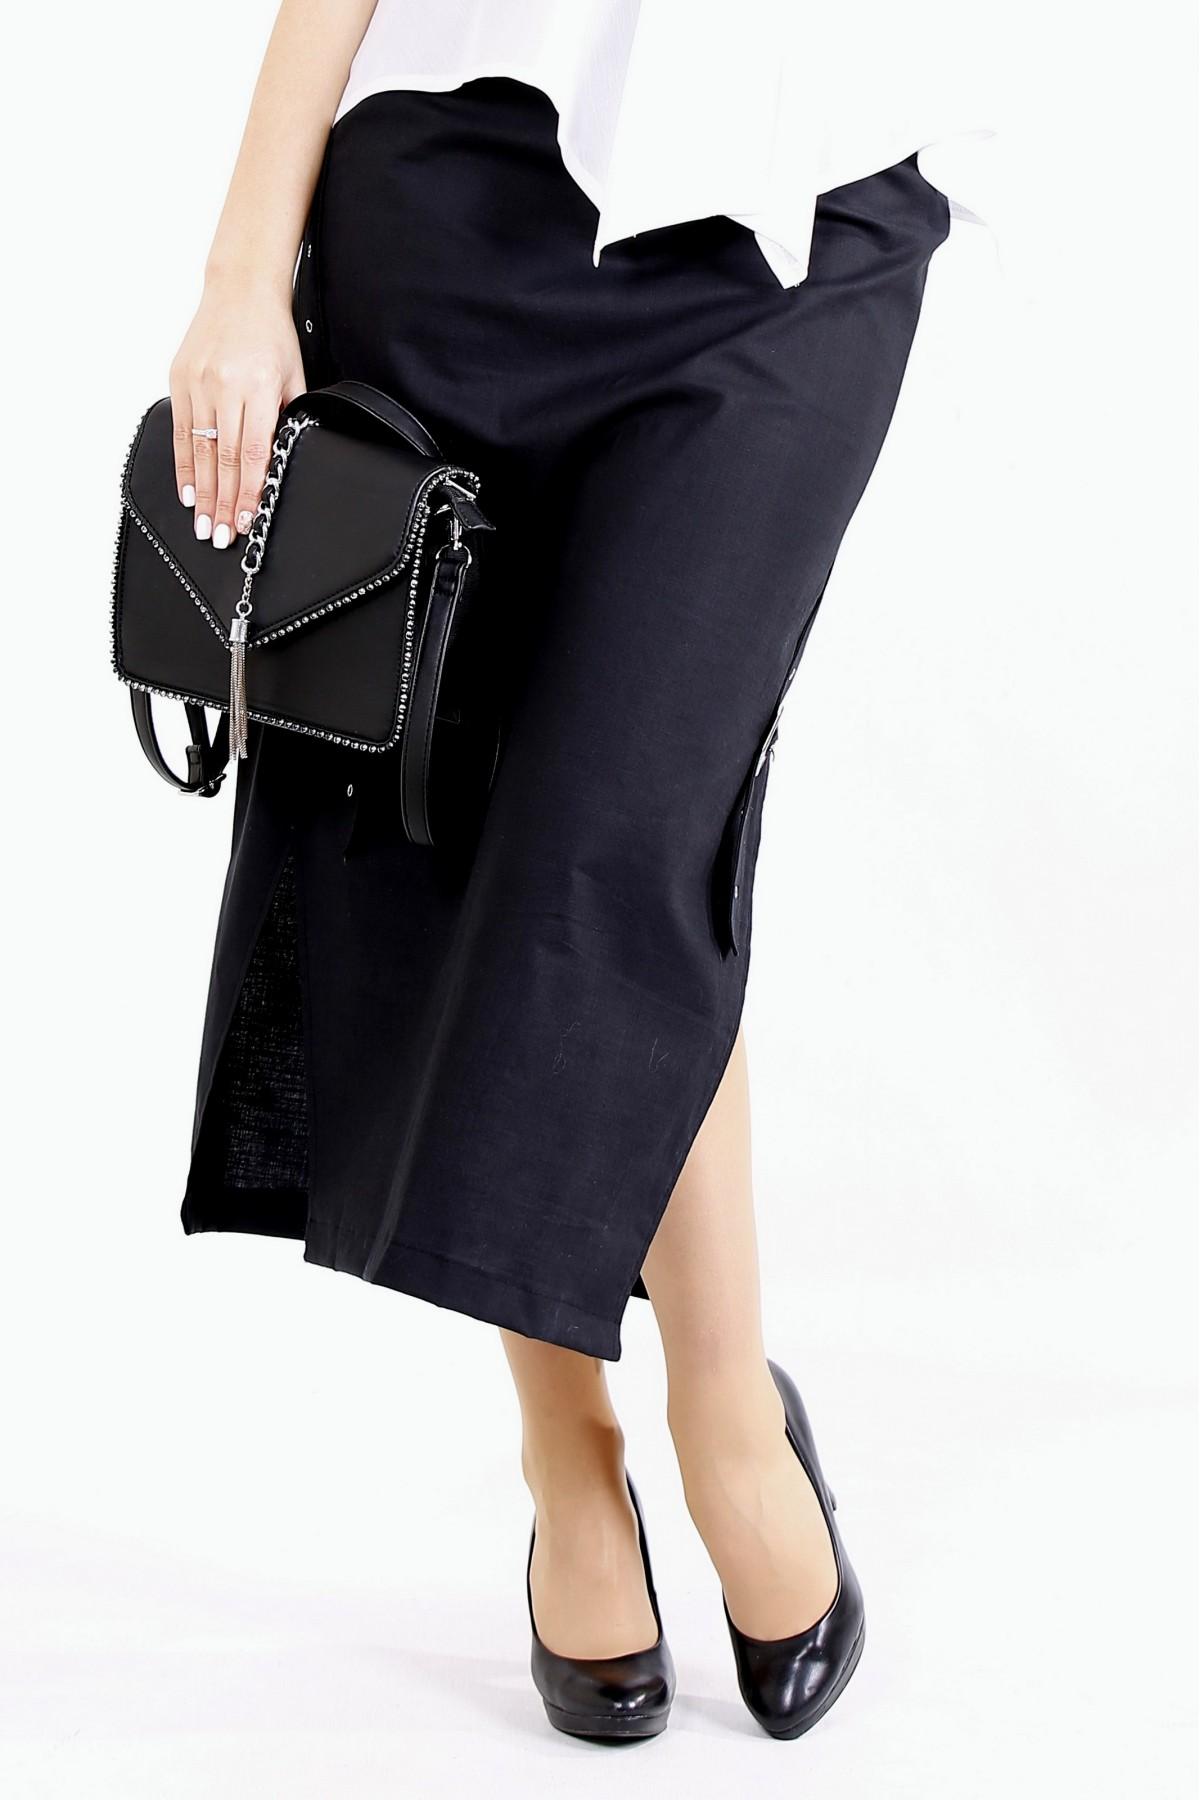 01111-1 | Черная льняная юбка ниже колена